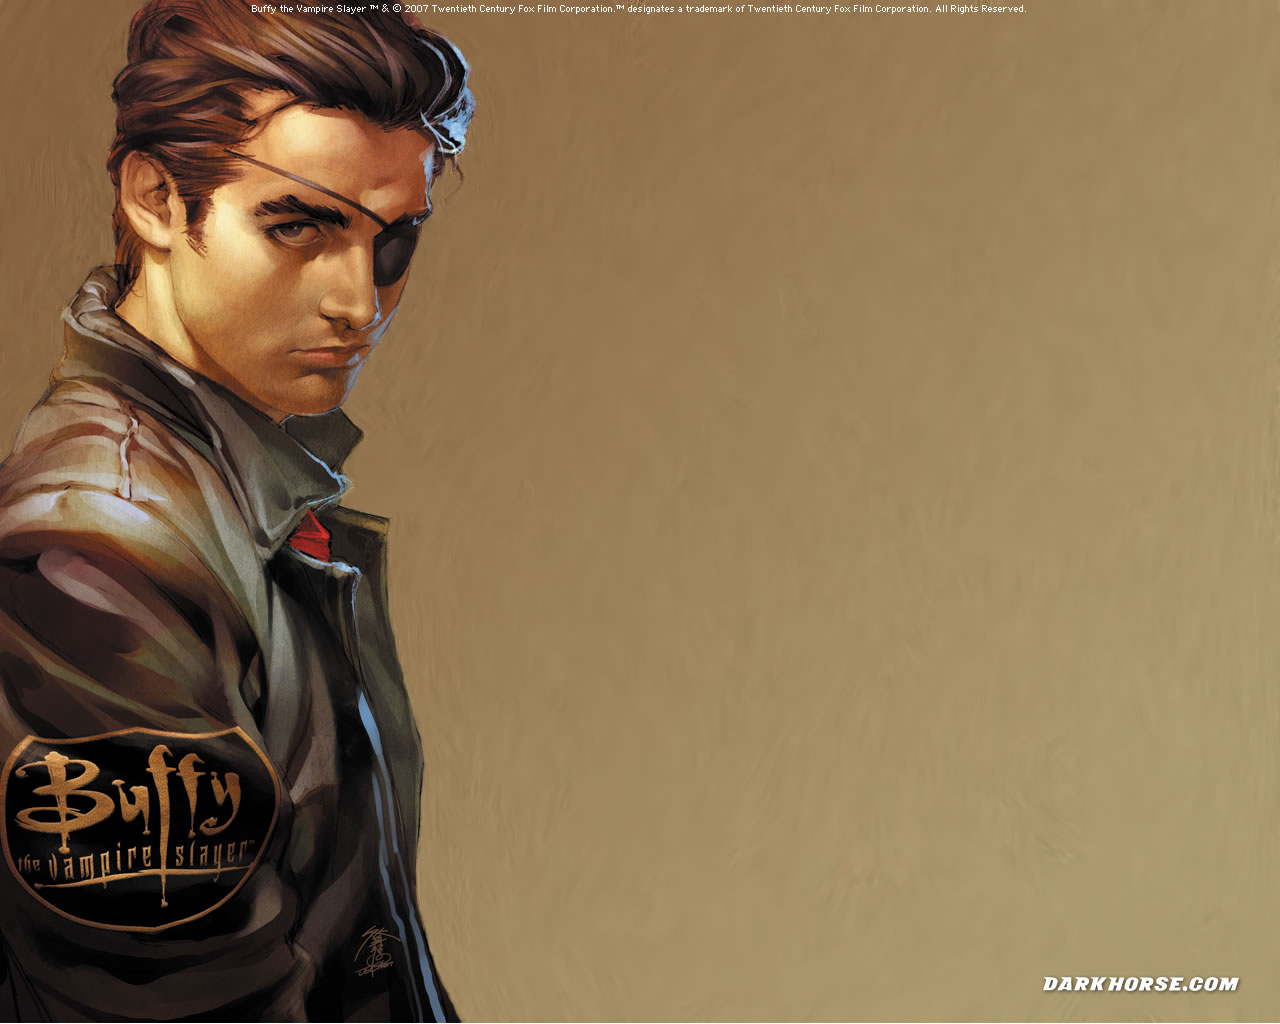 Buffy Comic achtergrond